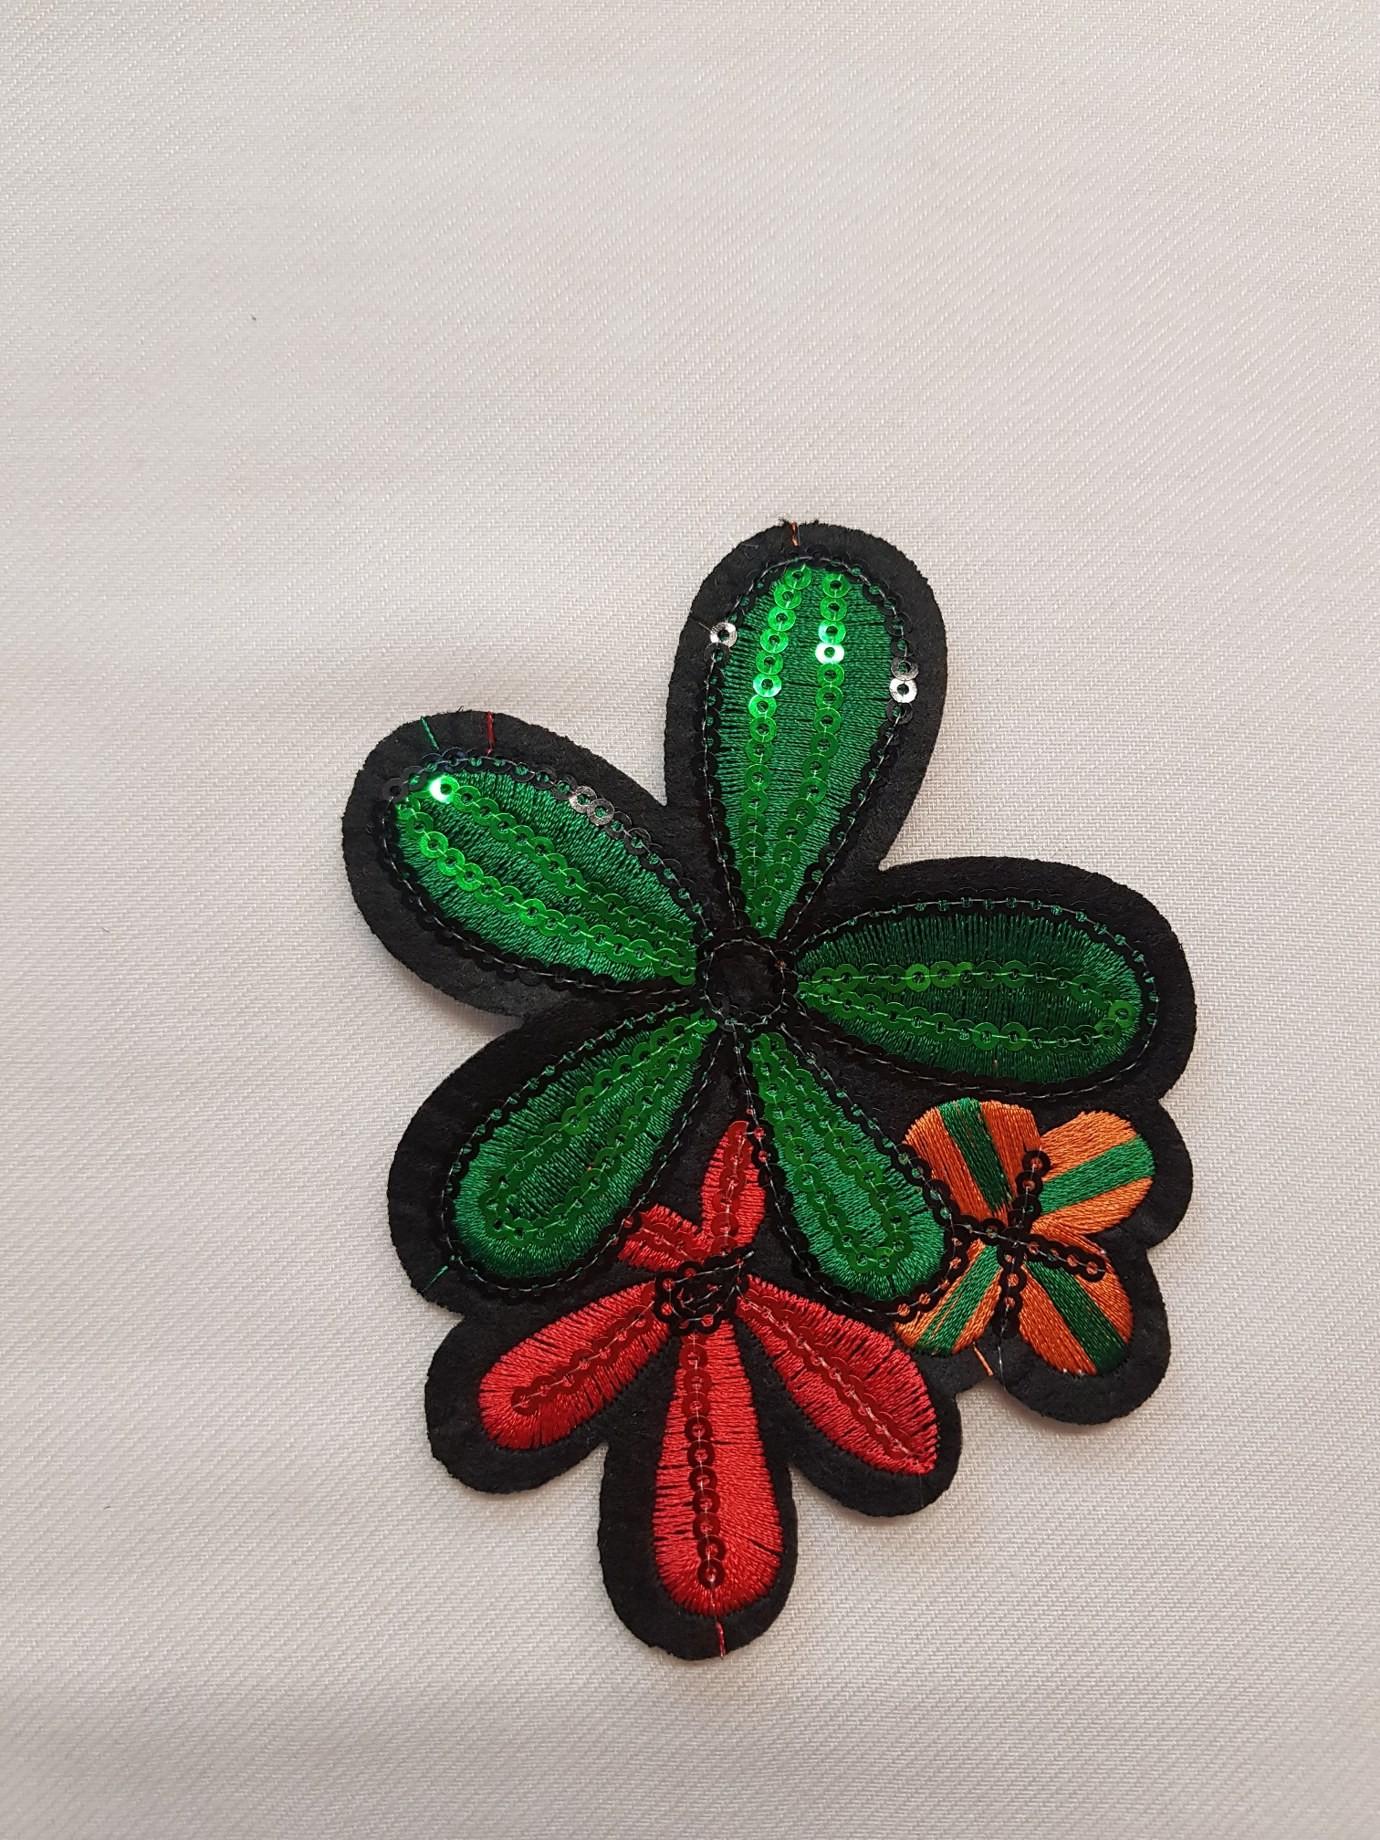 Aplicatie verde florala brodata cu paiete transparante